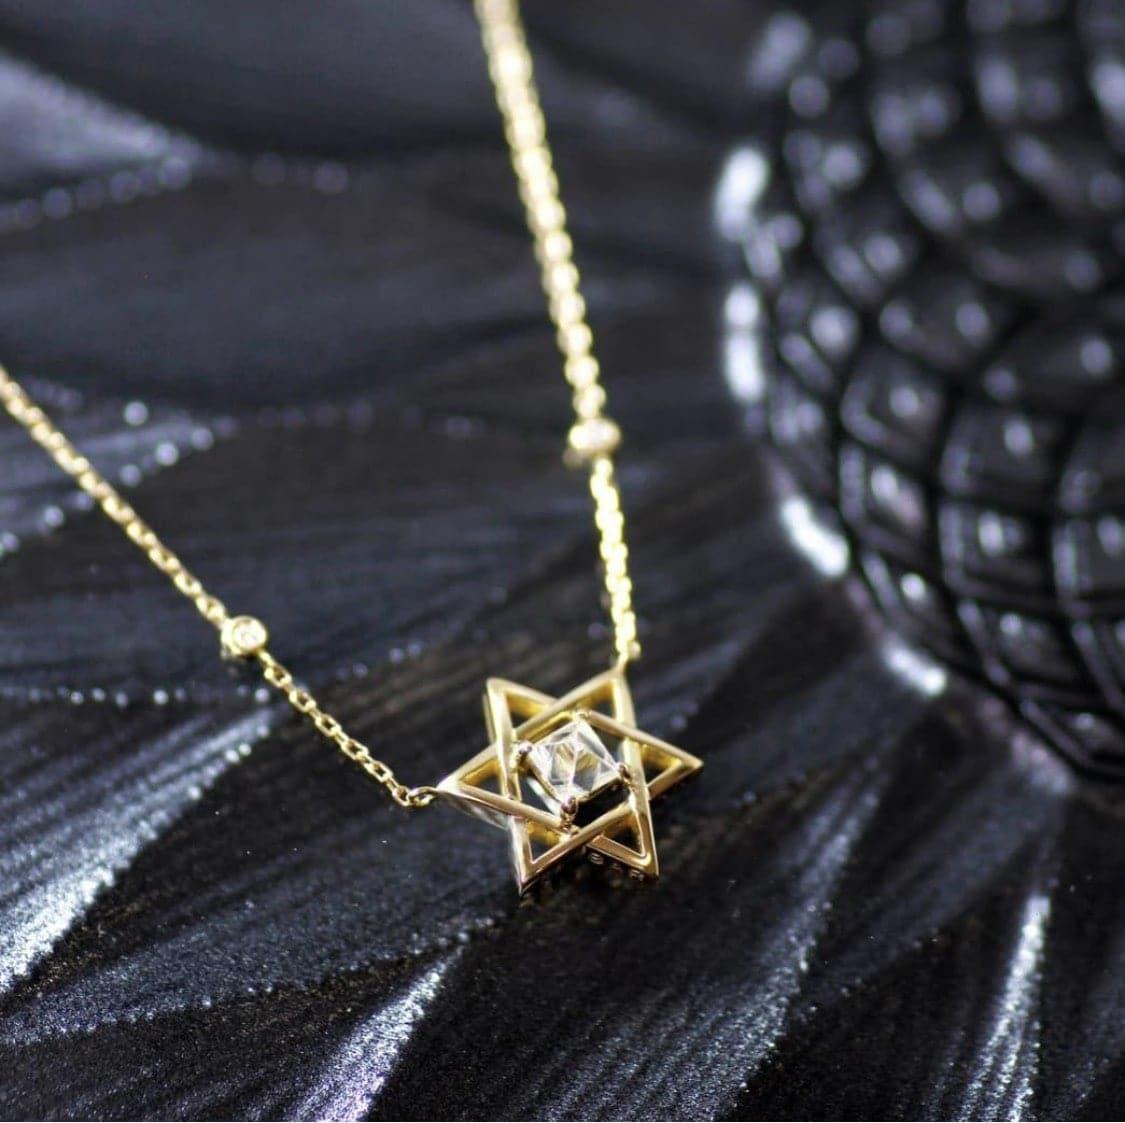 Sasha jewelry*ダイヤモンド原石ジュエリー〜六芒星〜(宝石セッション、ペンダントトップ、チェーン含む)のイメージその1